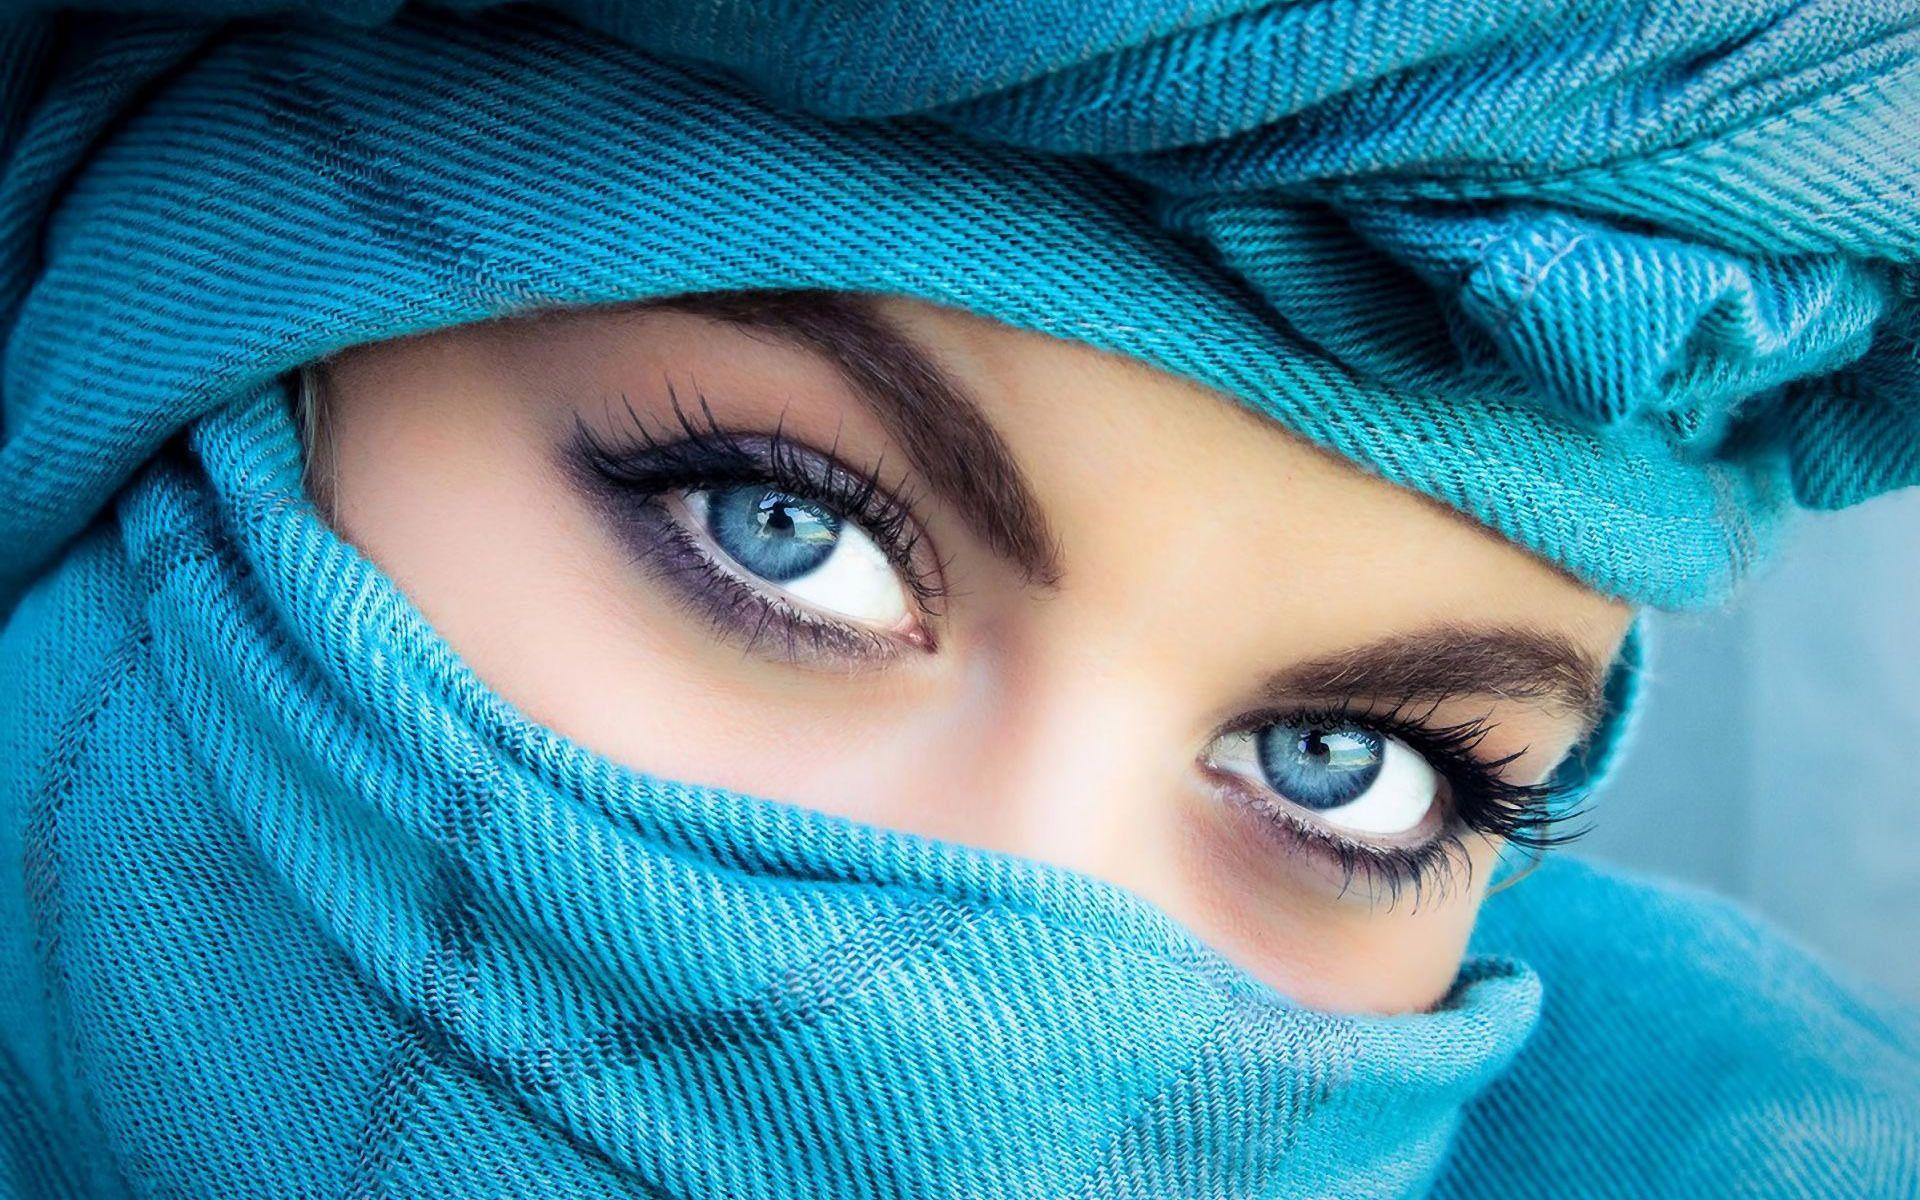 Blue Eyed Girl Wallpaper Wallpaper Wide Hd Most Beautiful Eyes